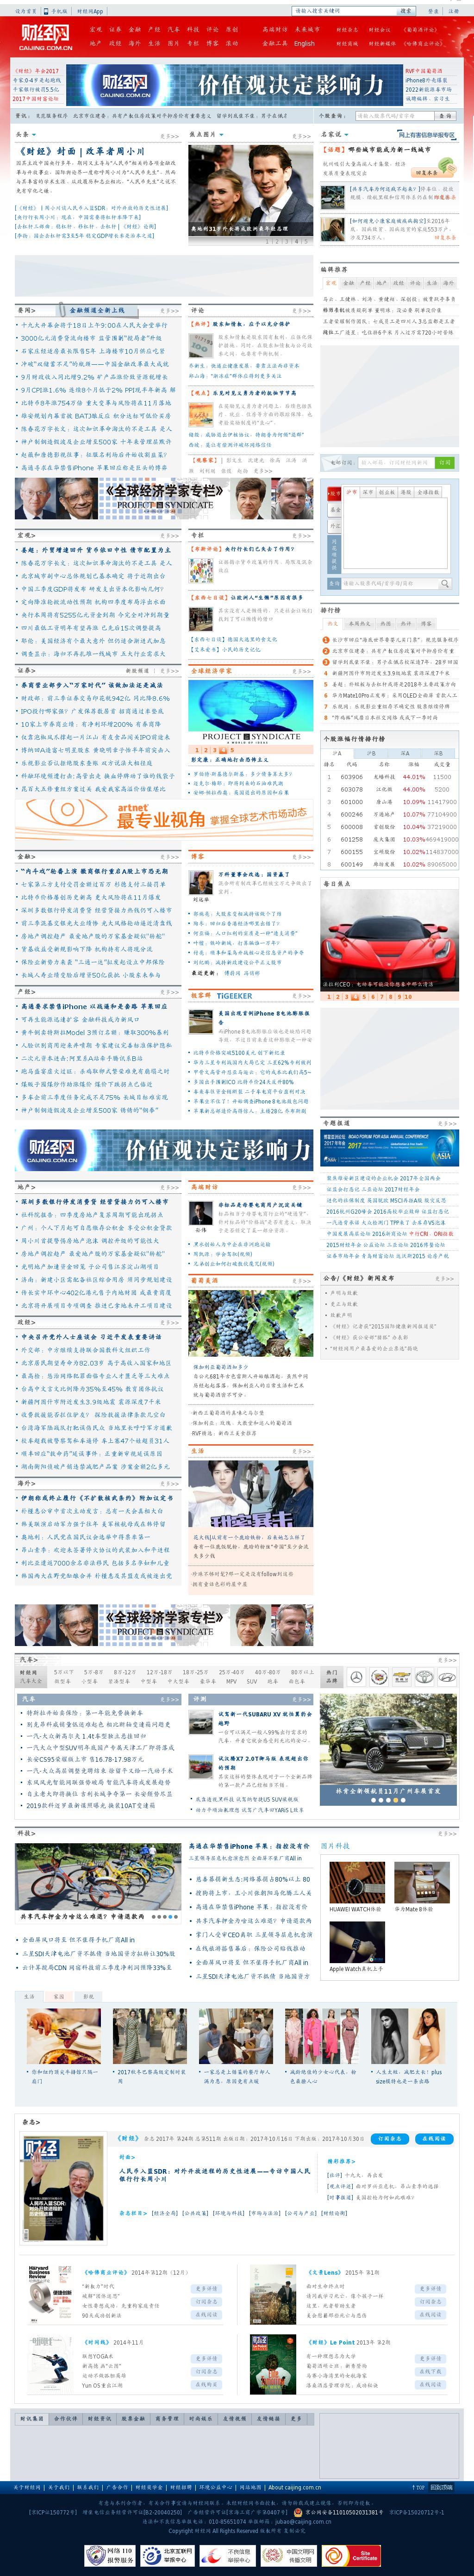 Caijing at Monday Oct. 16, 2017, 9 p.m. UTC